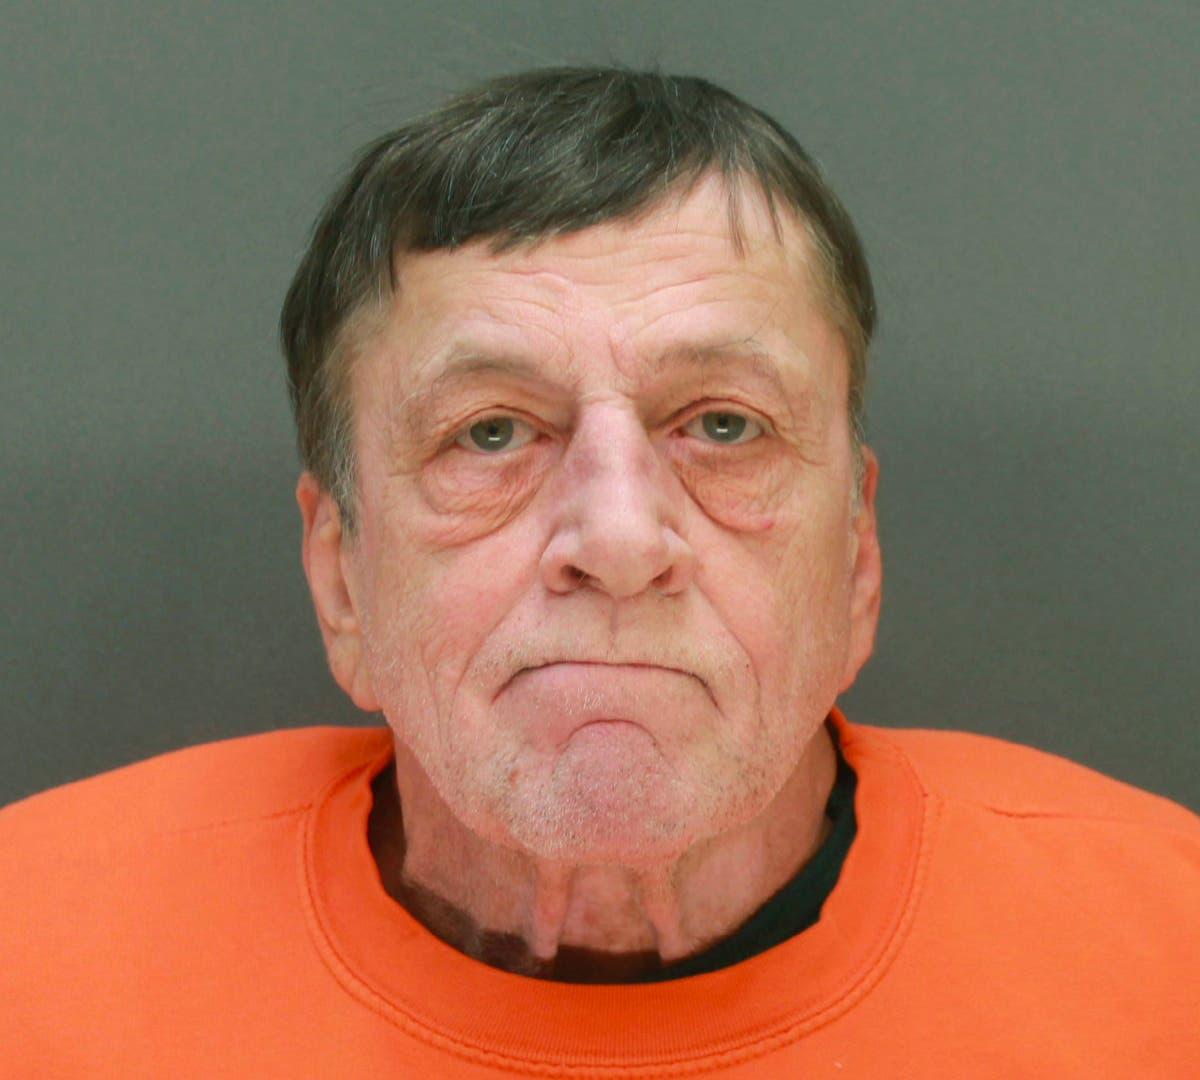 Minnesota clinic shooting brings premeditated murder charge